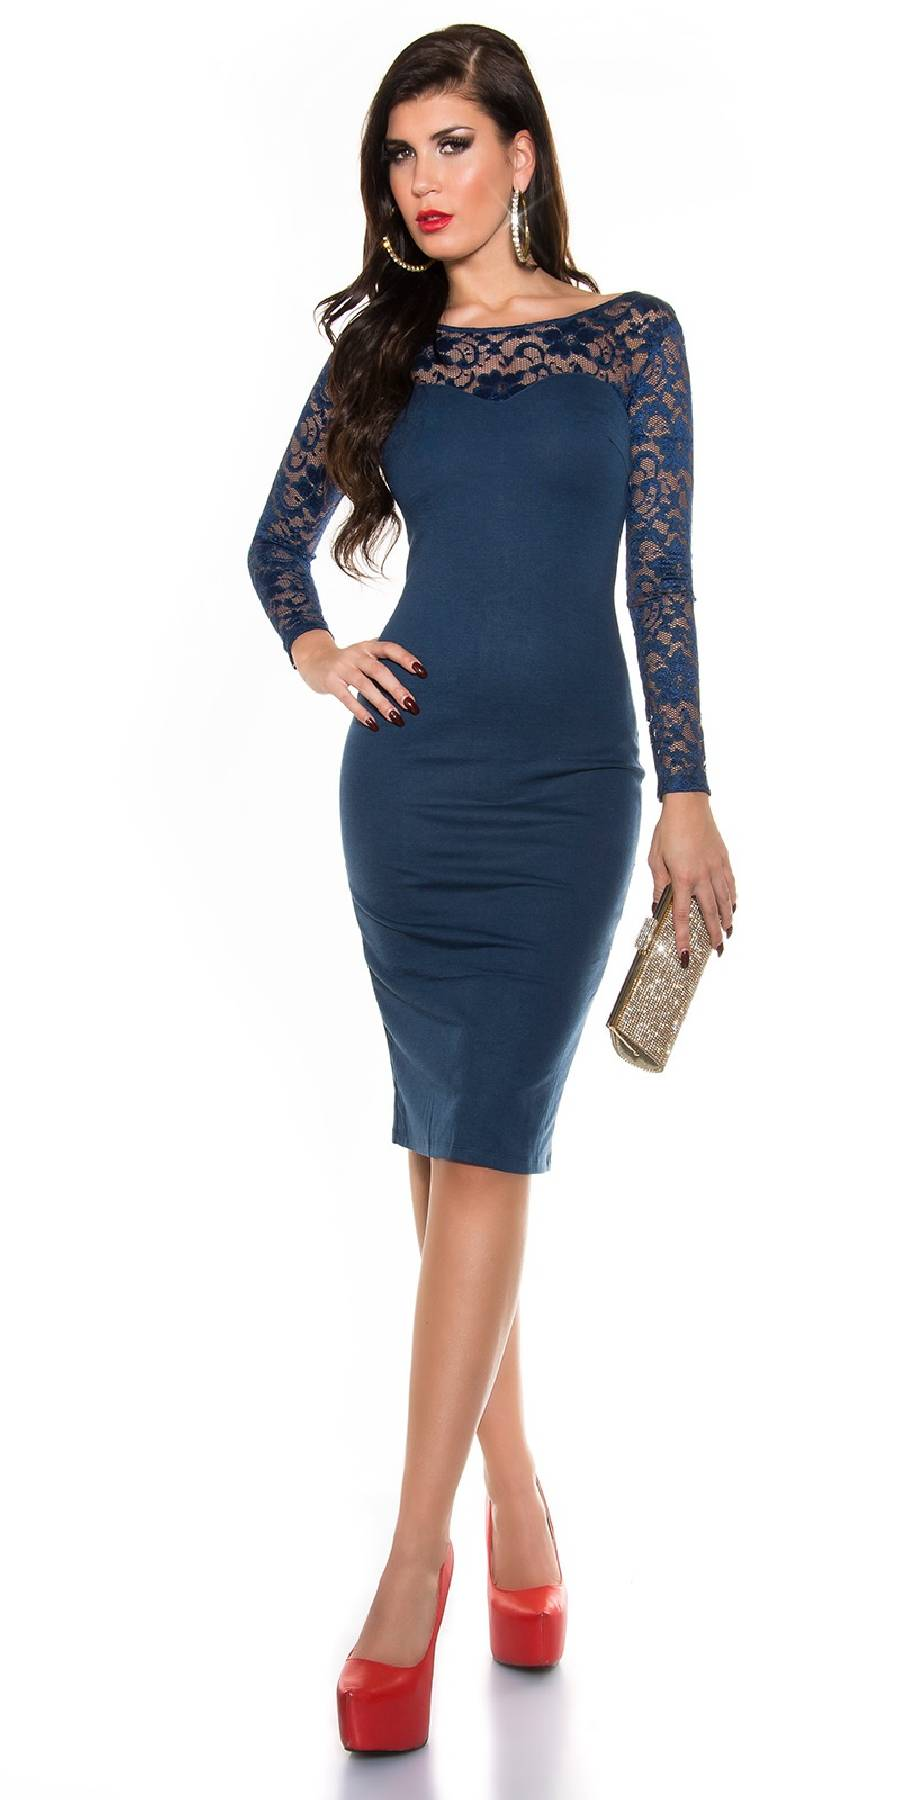 Collier tendance fashion ZOE couleur turquoise